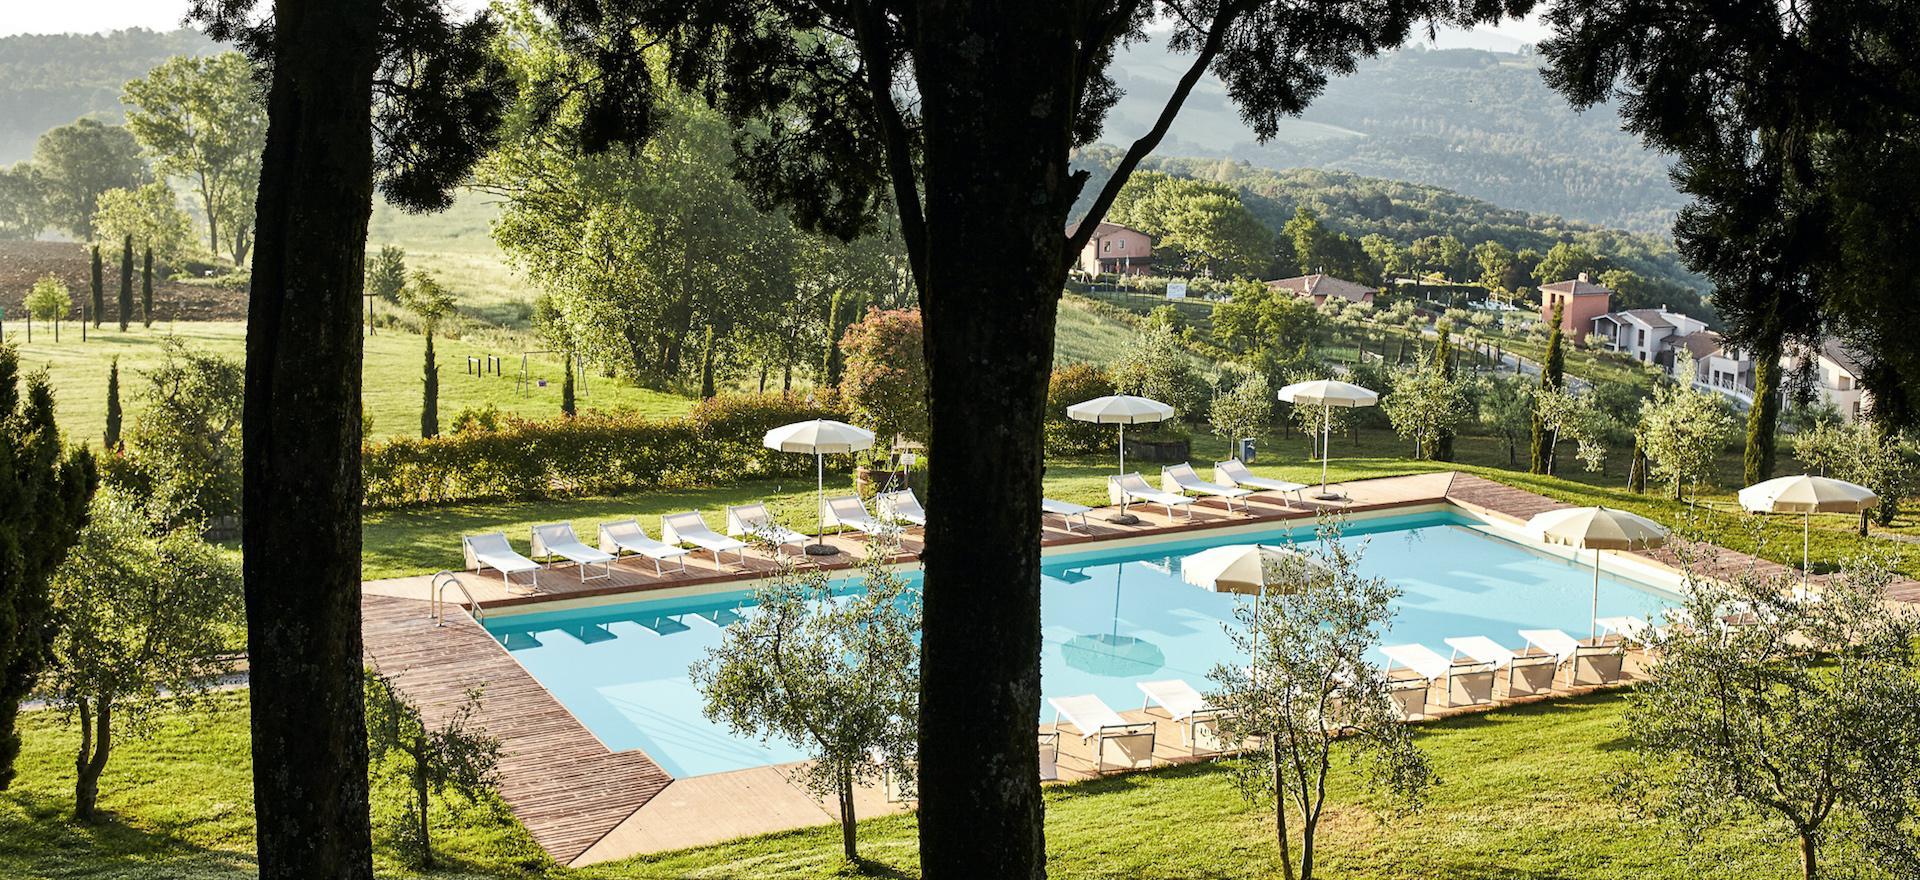 Kindvriendelijke agriturismo centraal gelegen in Toscane